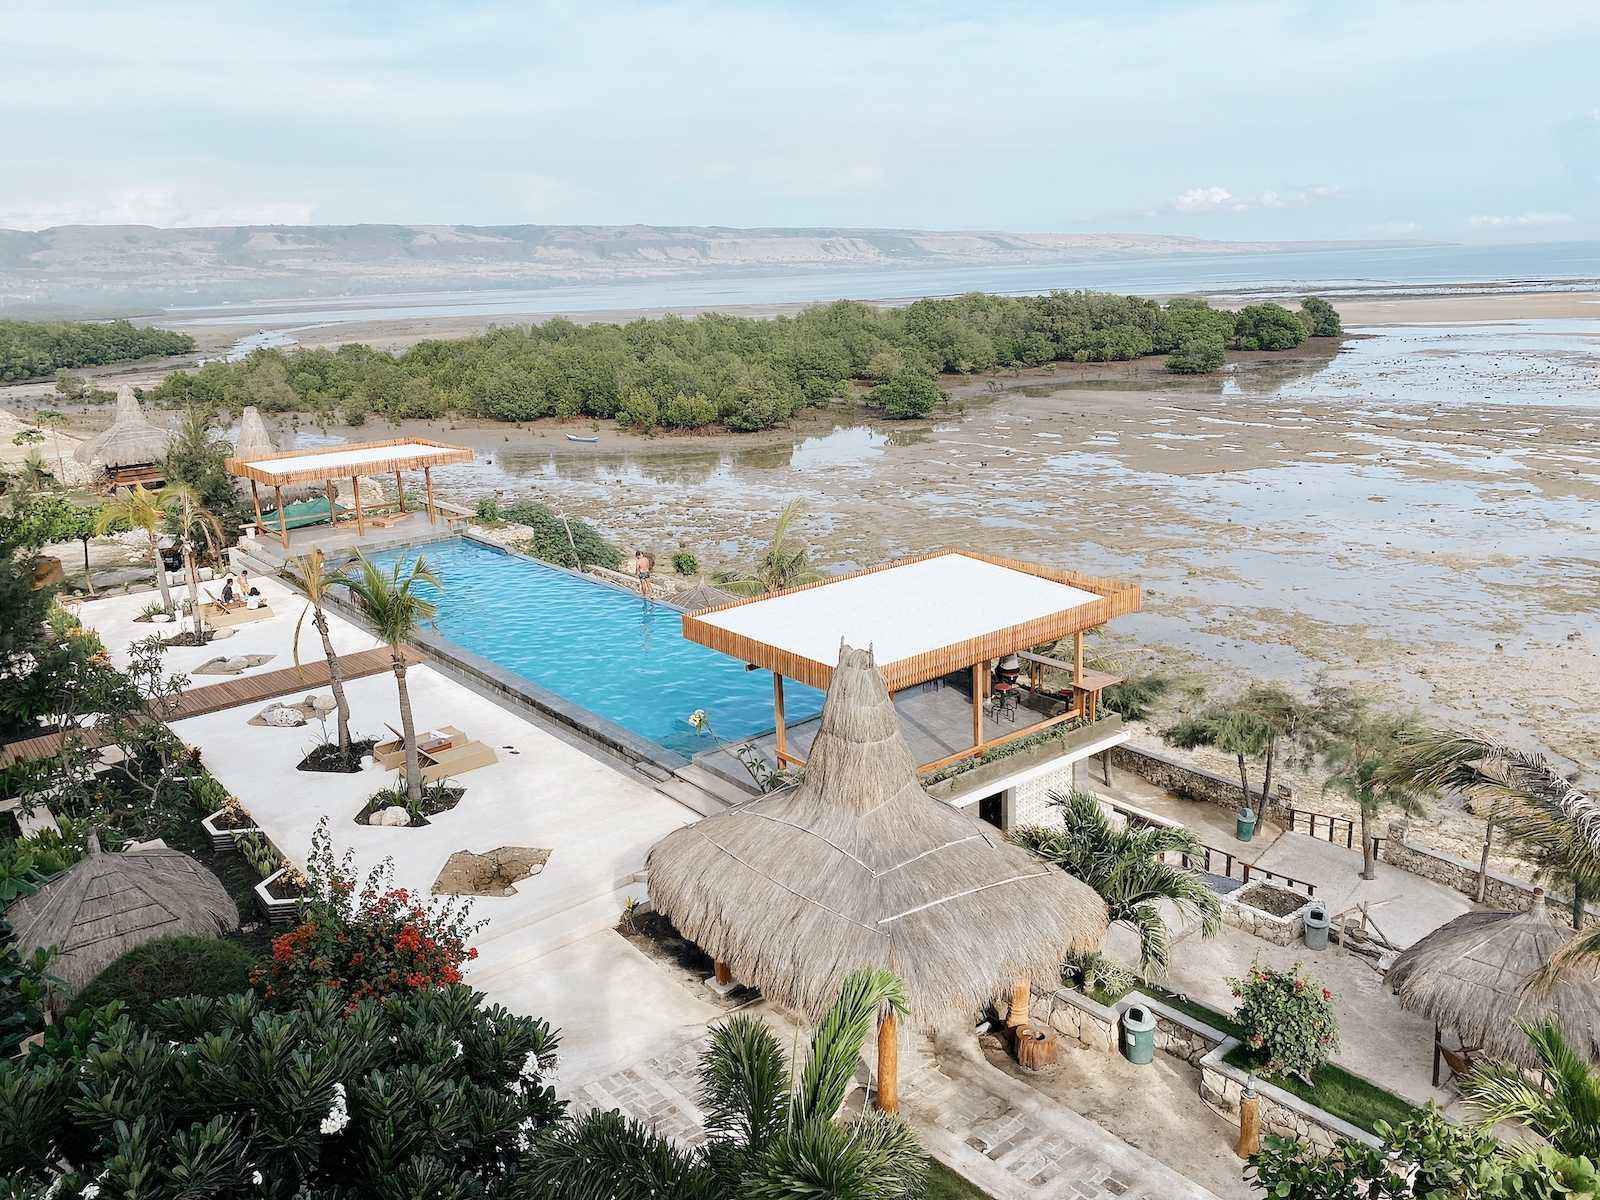 Studio Asri Sumba Beach Hotel Pulau Sumba, Nusa Tenggara Tim., Indonesia Pulau Sumba, Nusa Tenggara Tim., Indonesia Studio-Asri-Sumba-Beach-Hotel  107228